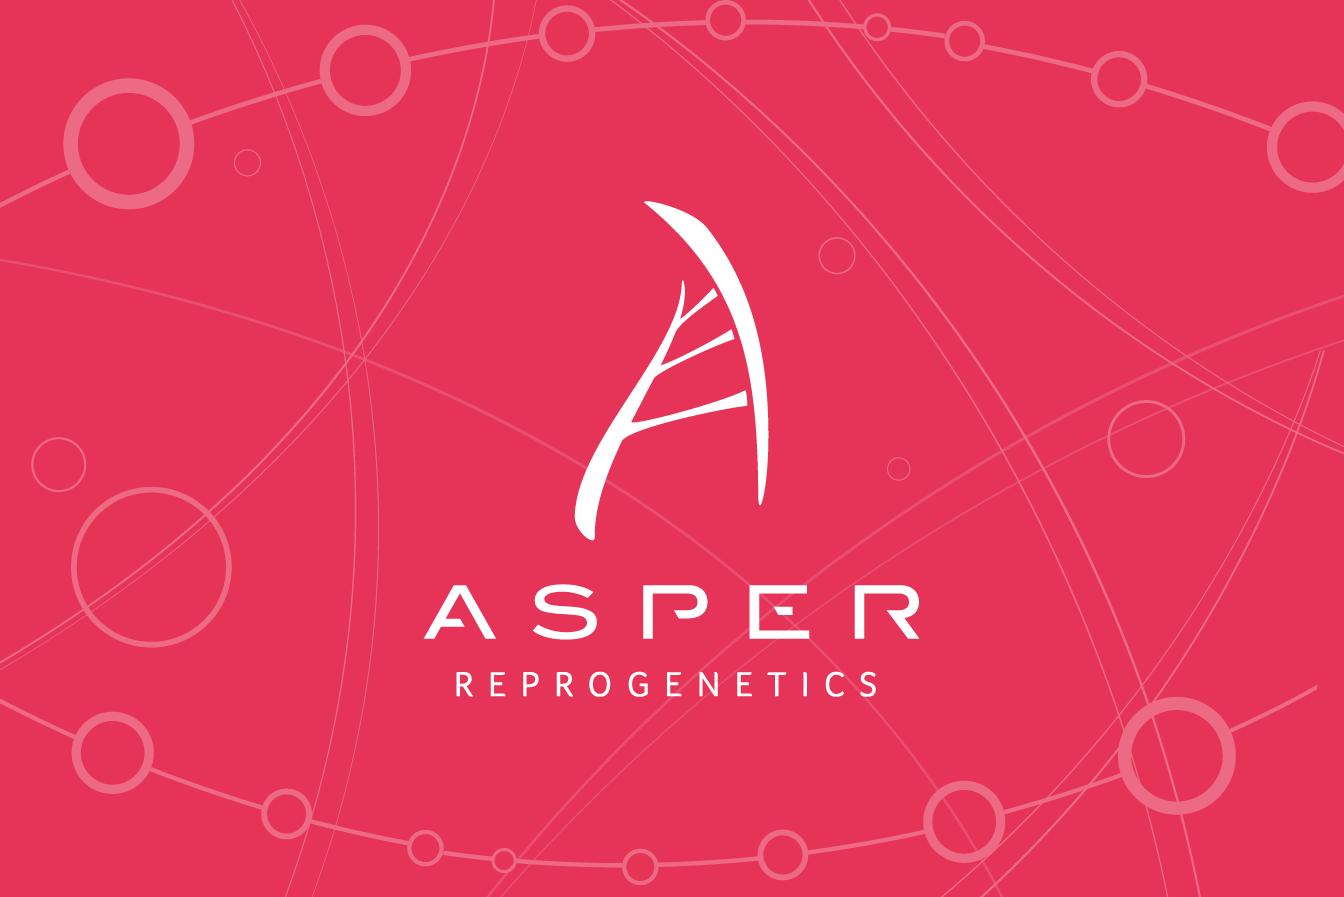 Asper Reprogenetics News